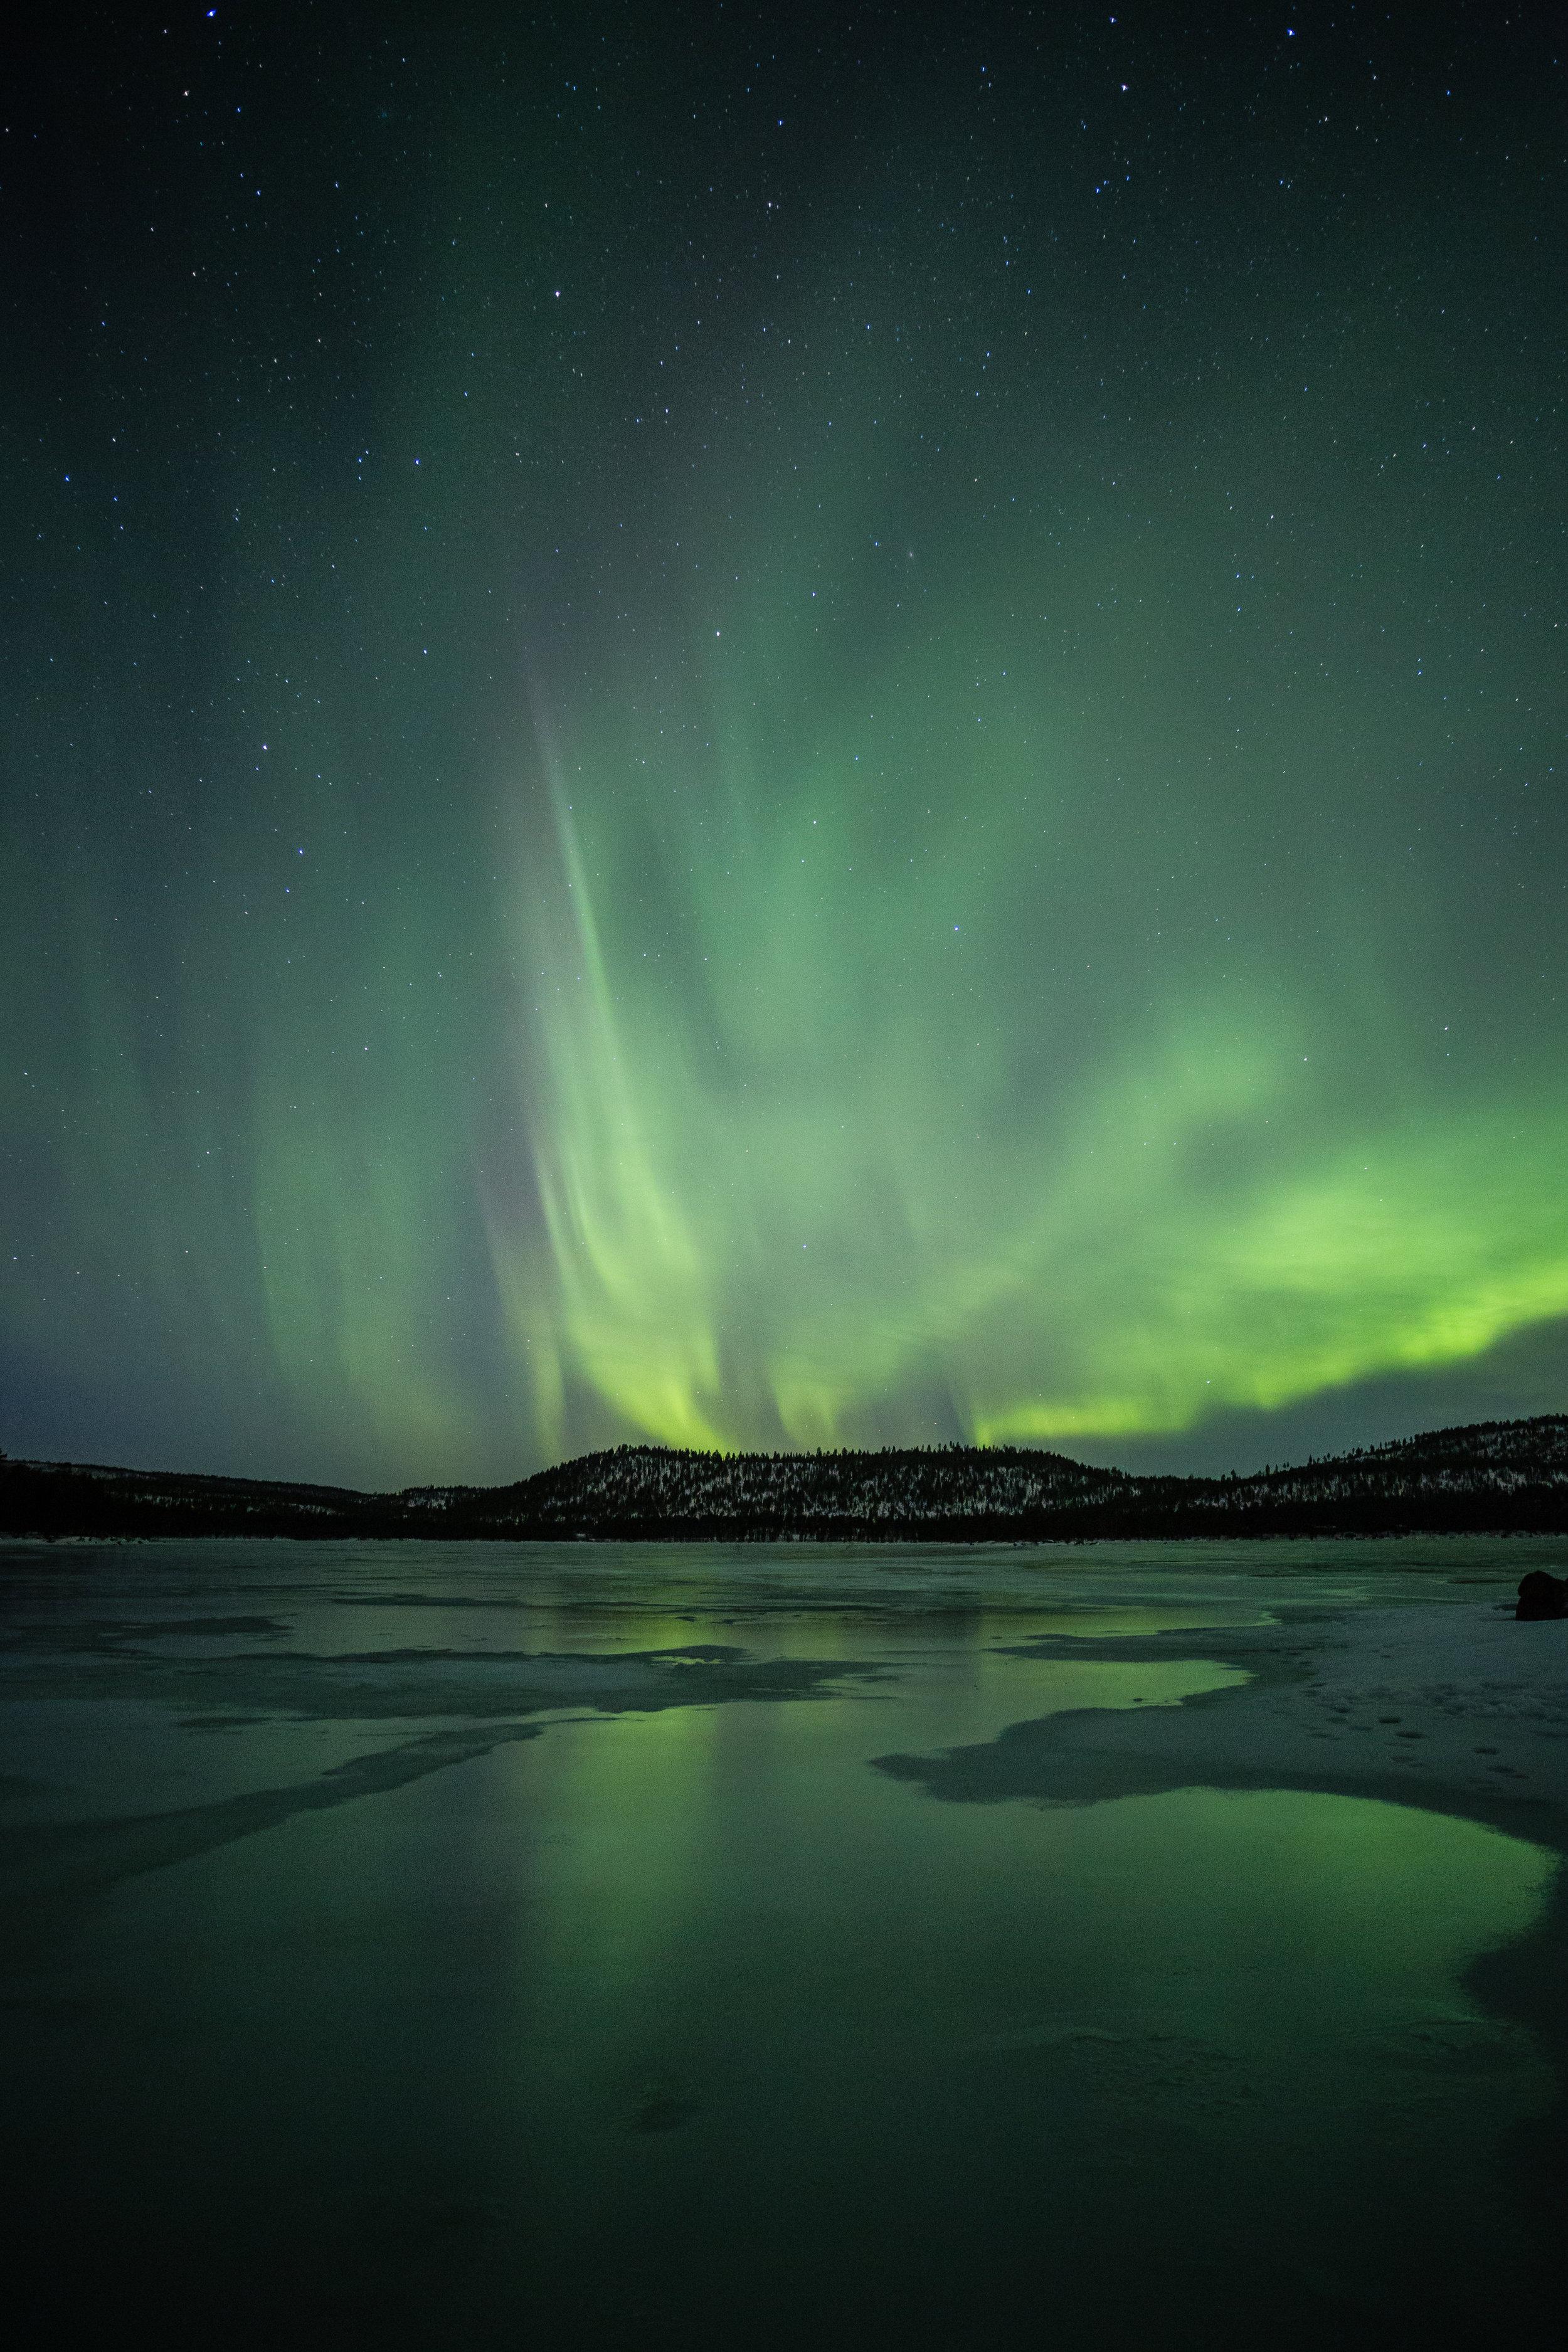 Aurora Borealis - The most enchanting natural phenomenon.